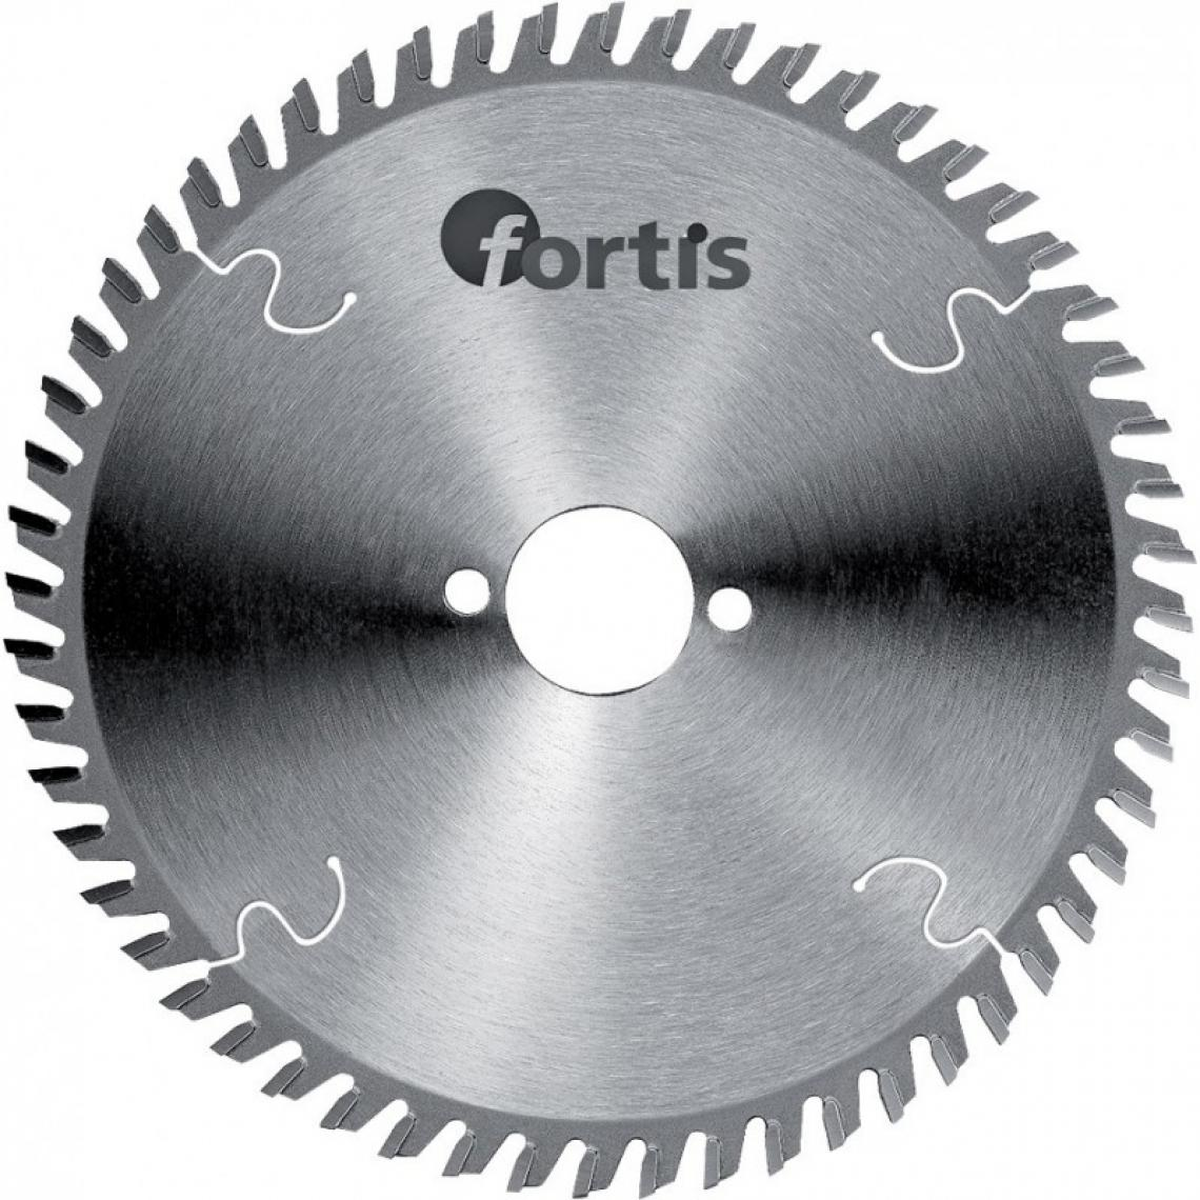 Fortis HW-Lame scie 216x3,0 x30mm Z48Wneg. Fortis